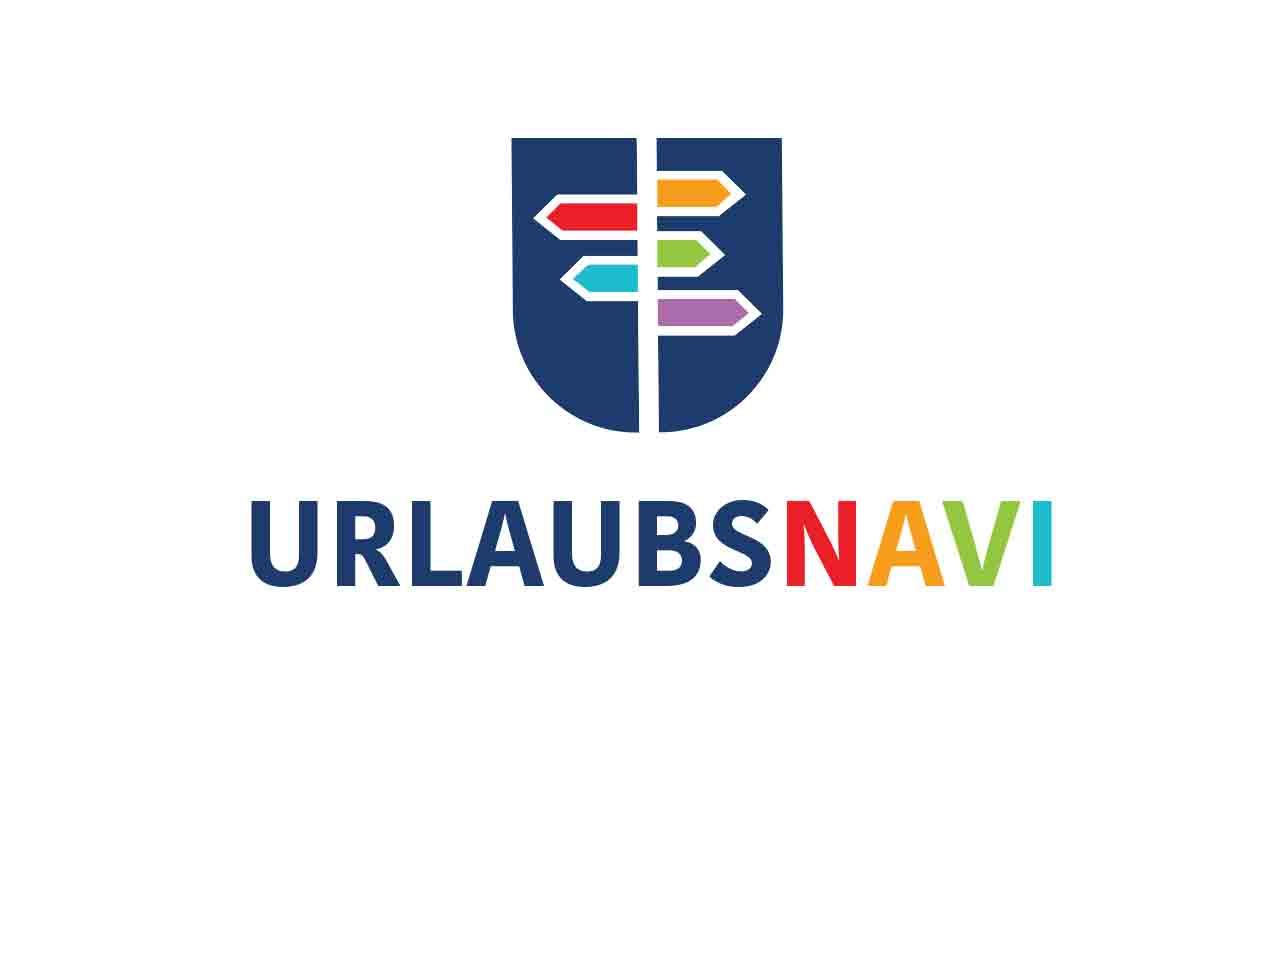 urlaubsnavi-logo-design